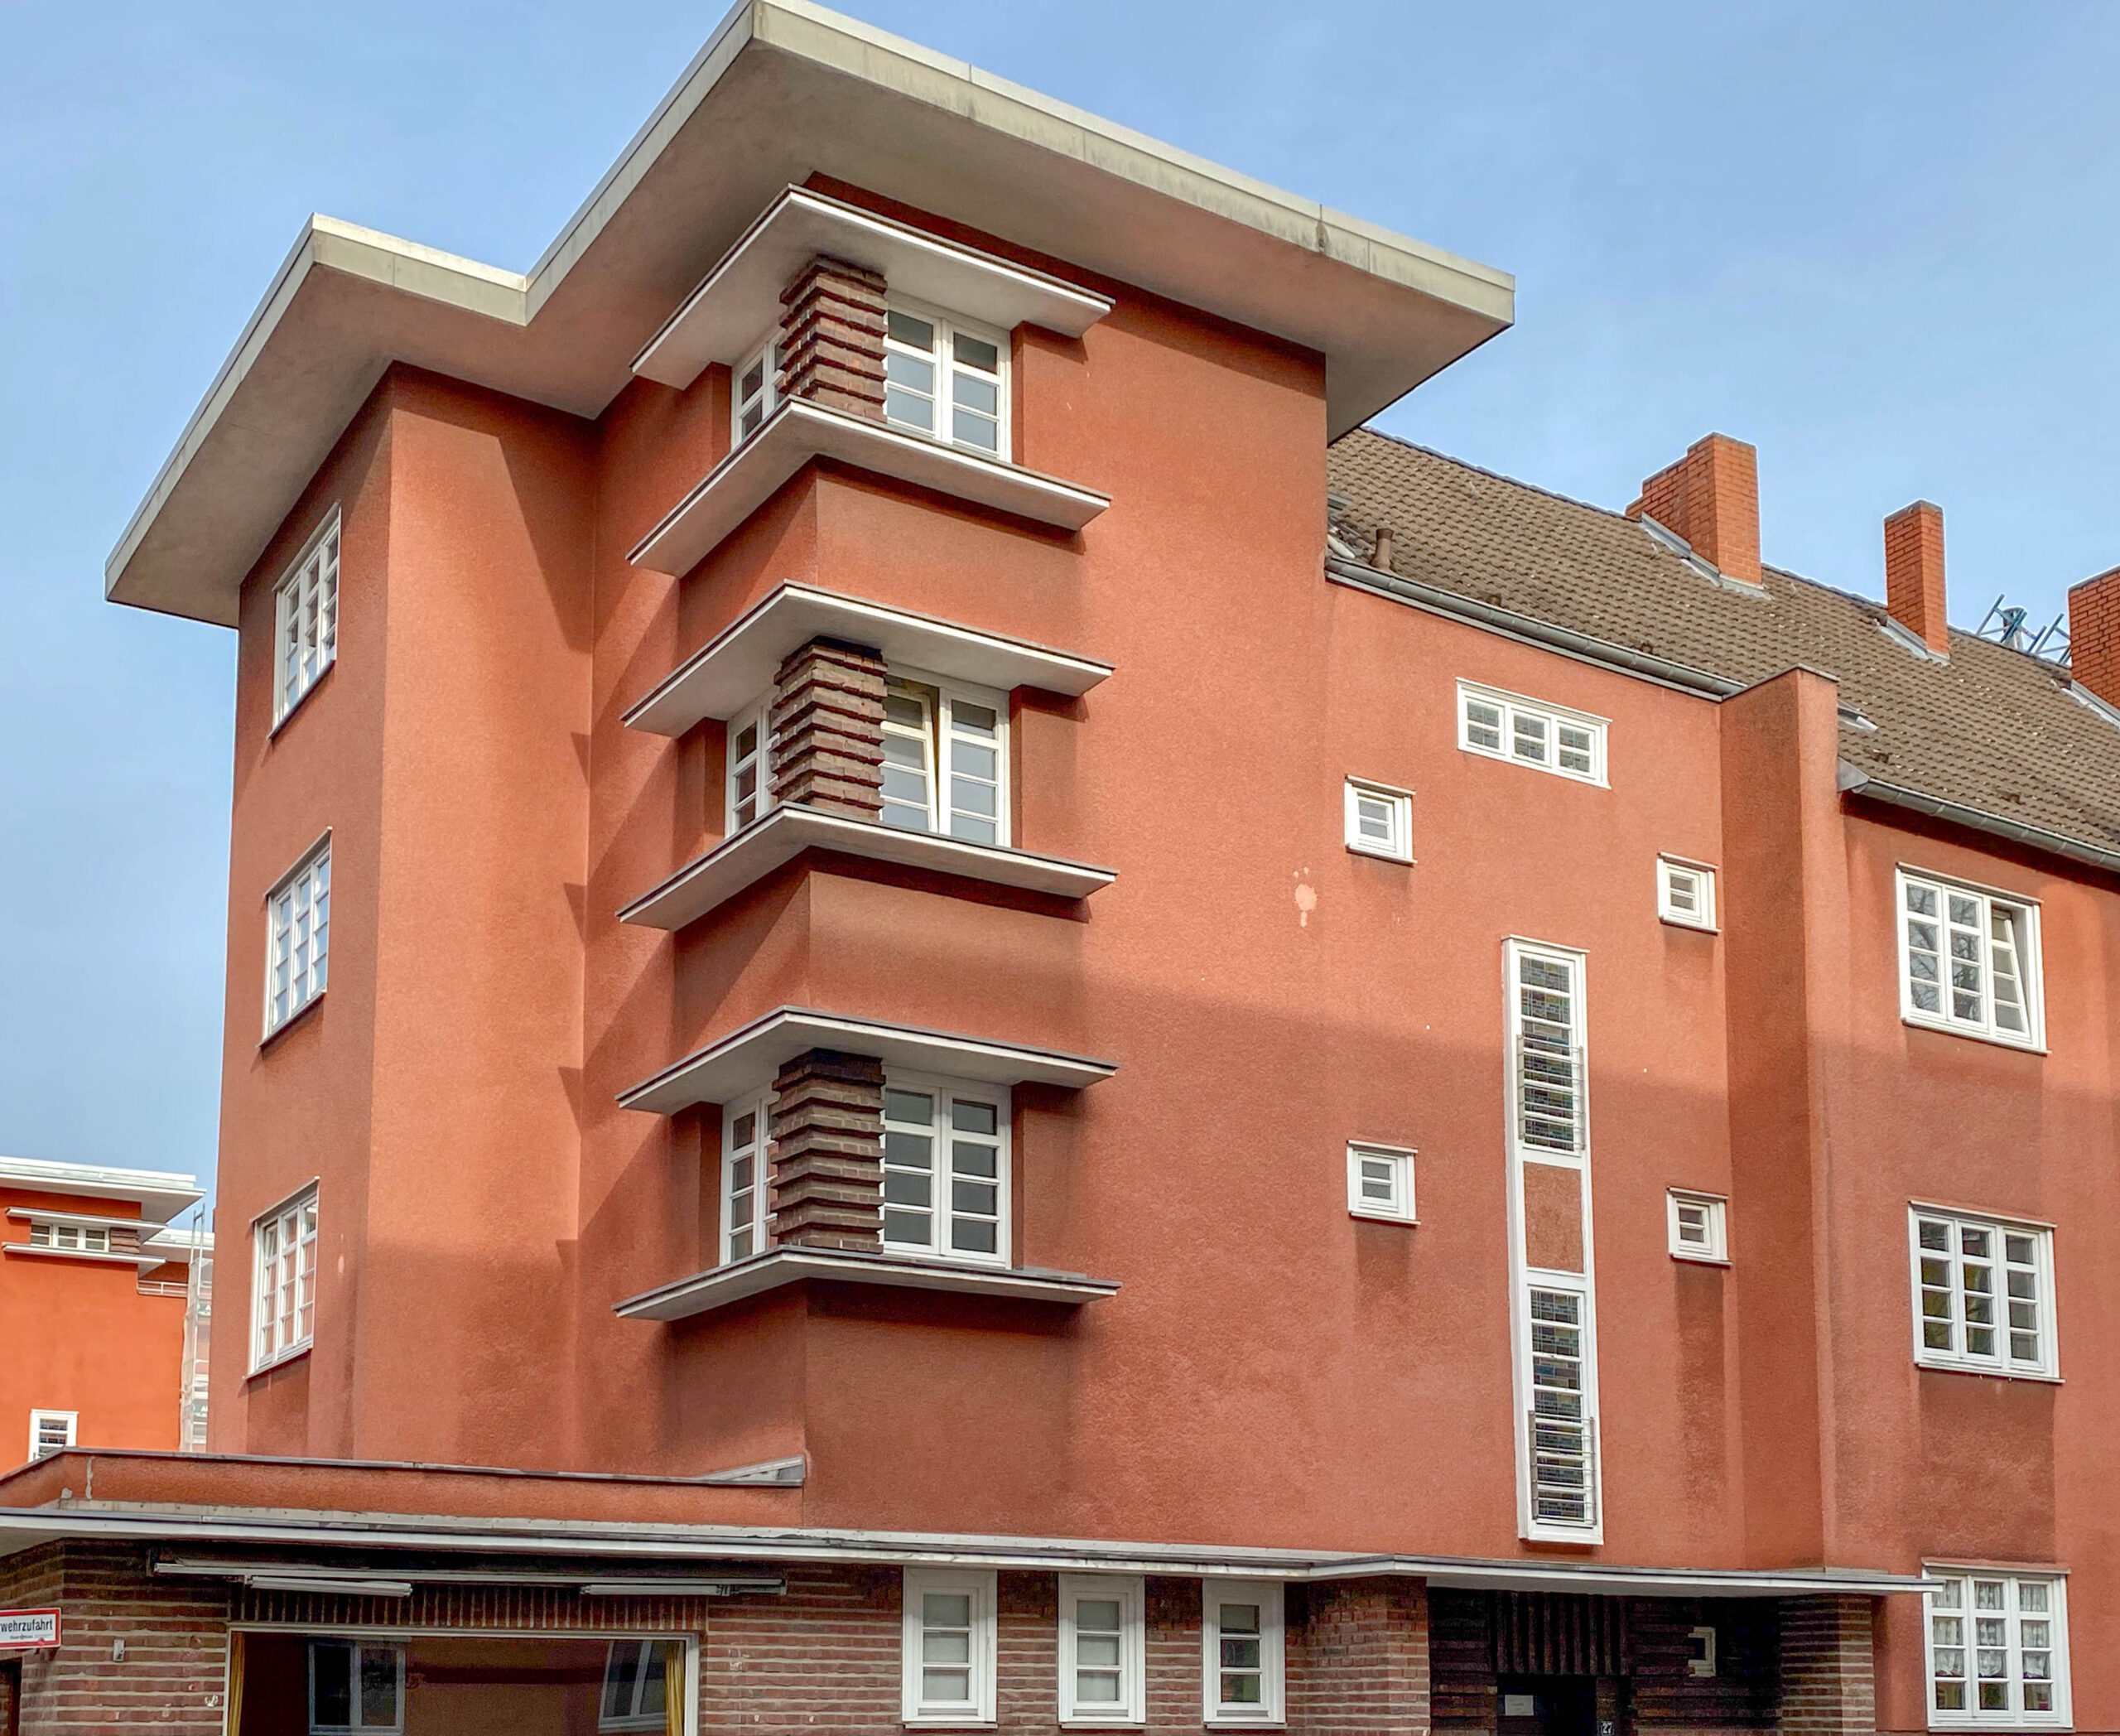 GAG Housing Estate Alpener Straße, 1927-1928. Architect: Otto Müller-Jena